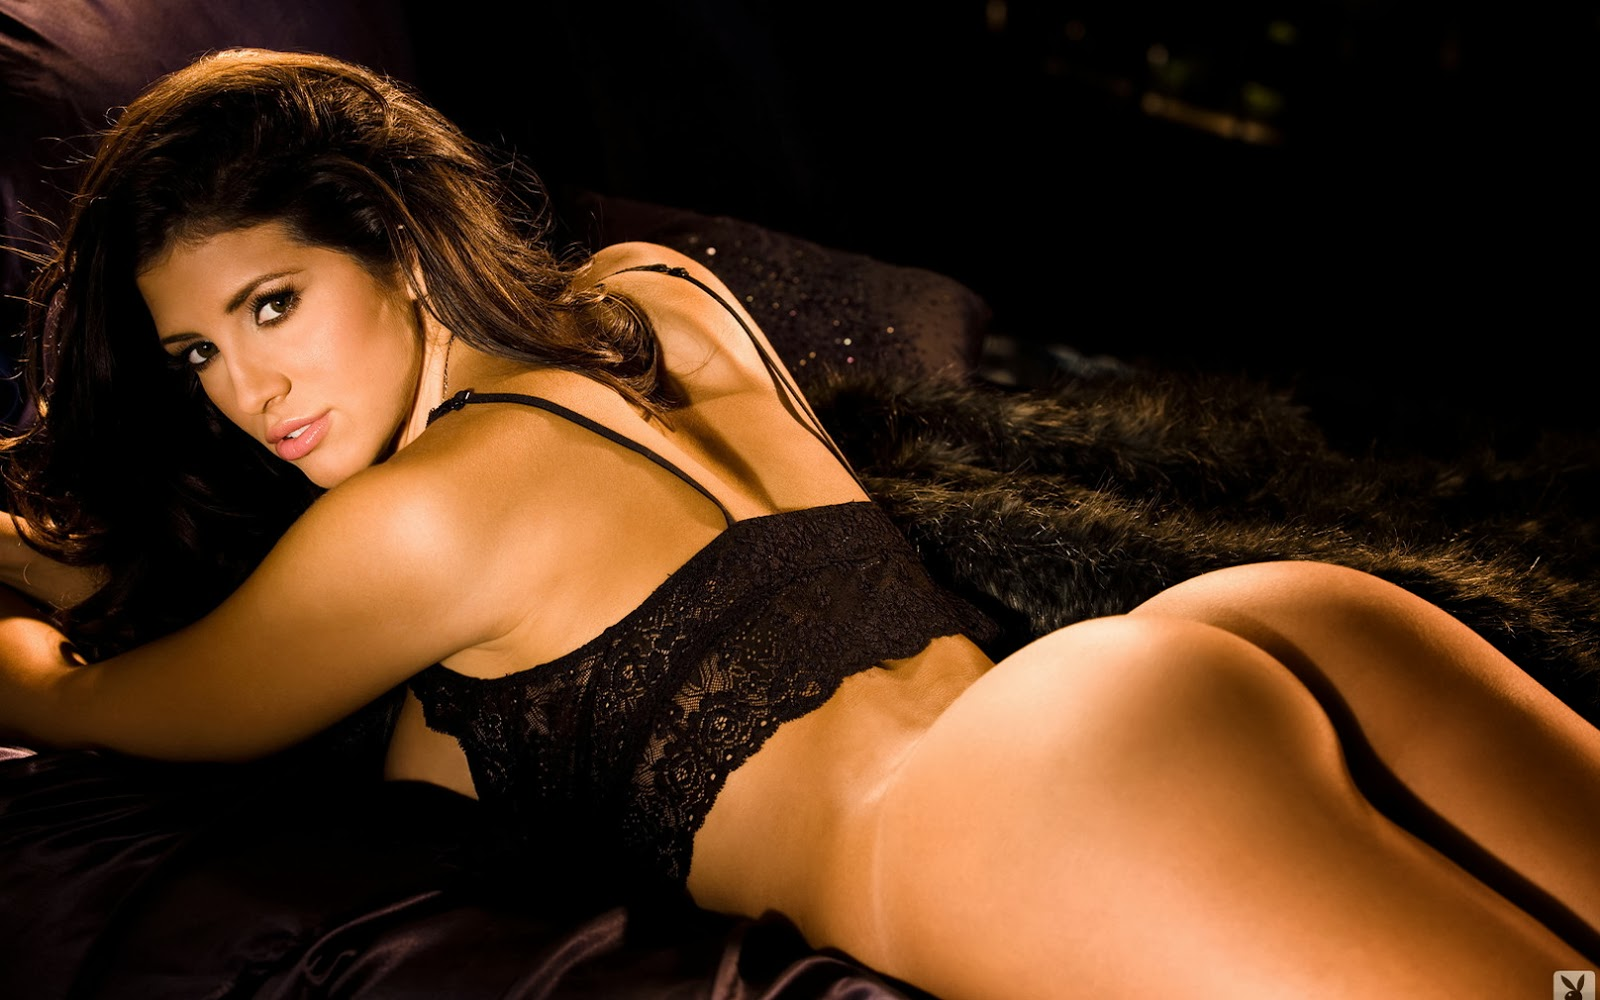 Hope Dworaczyk Sexiest Photos, Hot